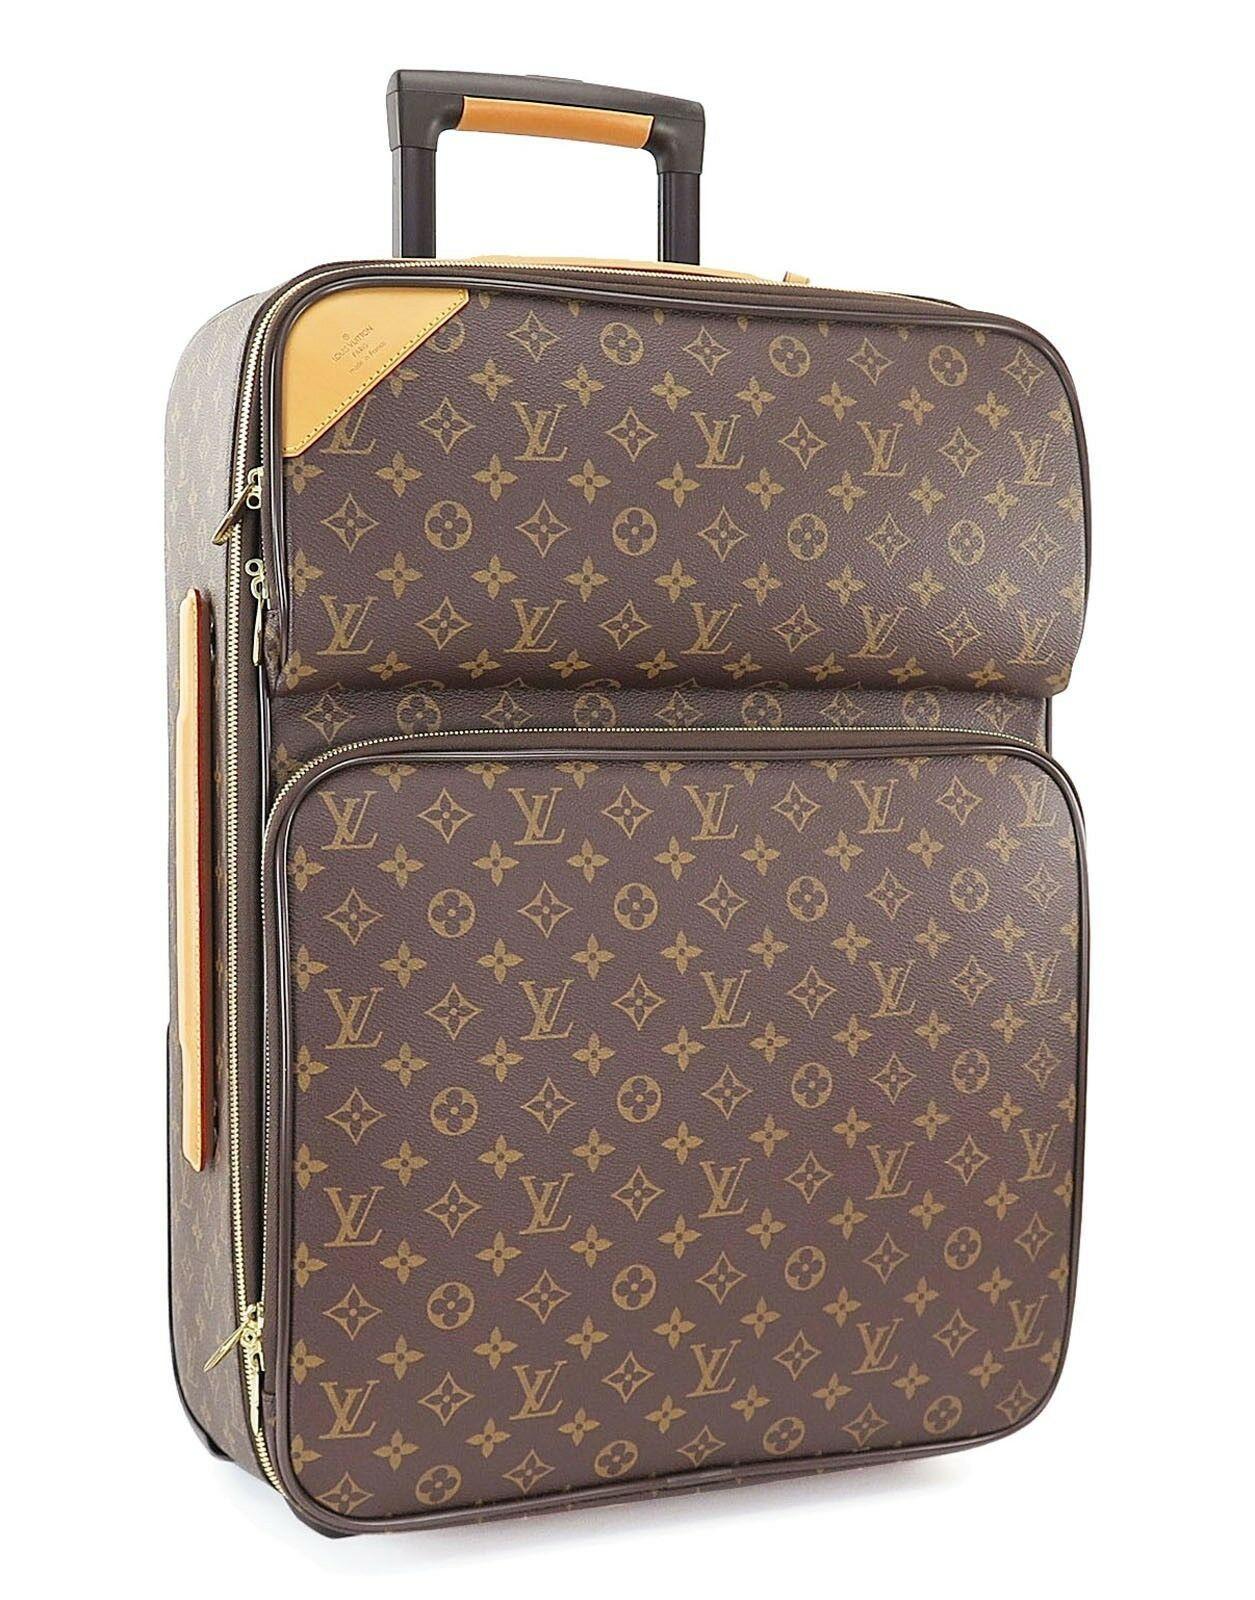 Auth LOUIS VUITTON Pegase 55 Business Monogram Travel Rolling Suitcase #30667